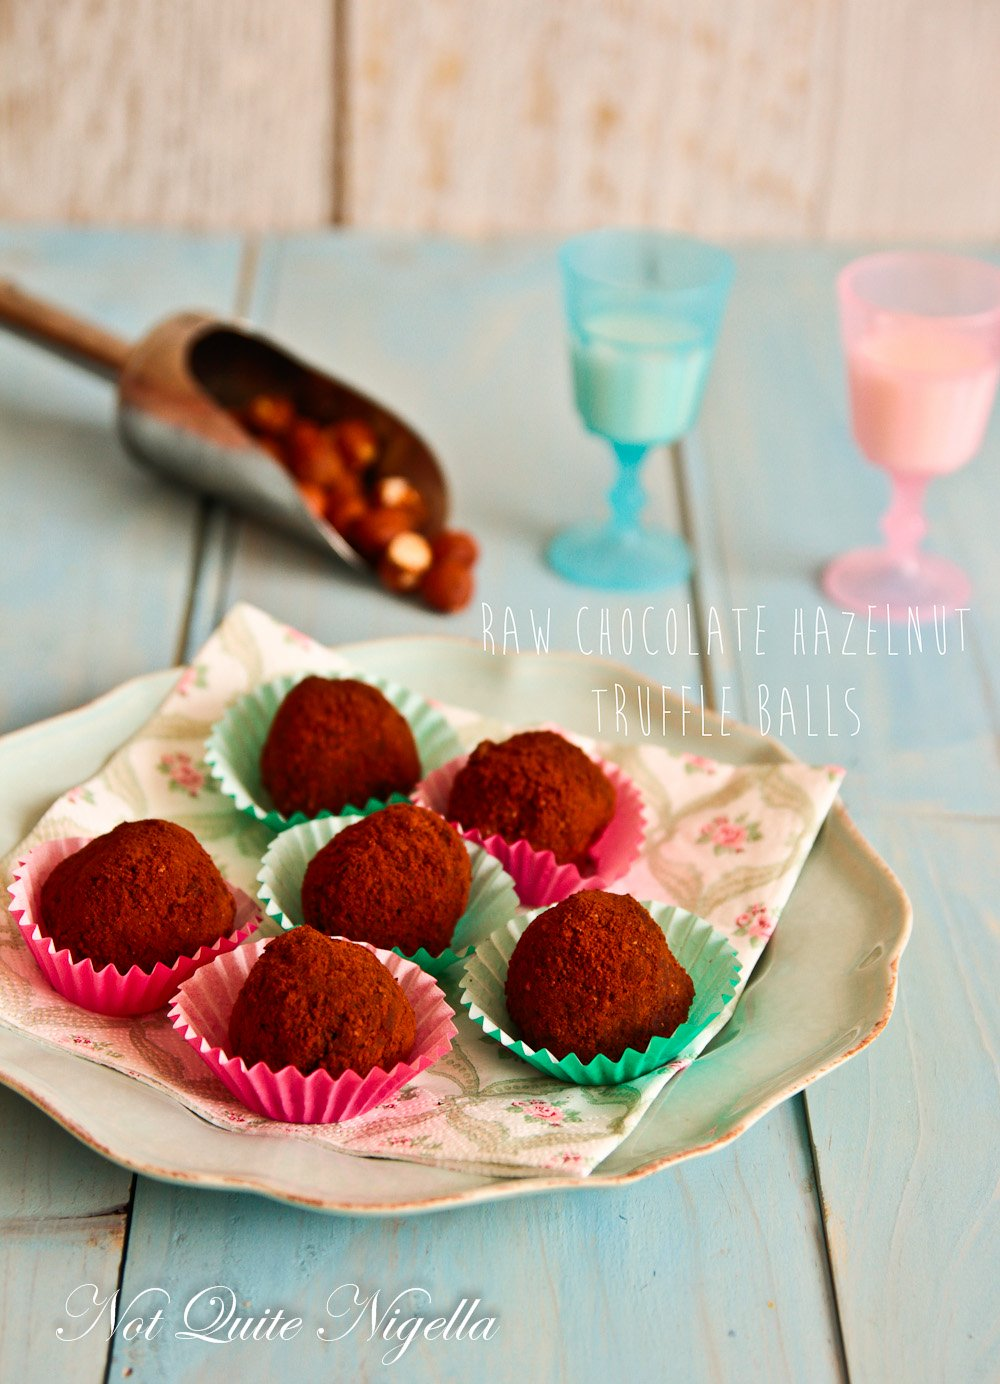 Chocolate Hazelnut Healthy Truffle Balls